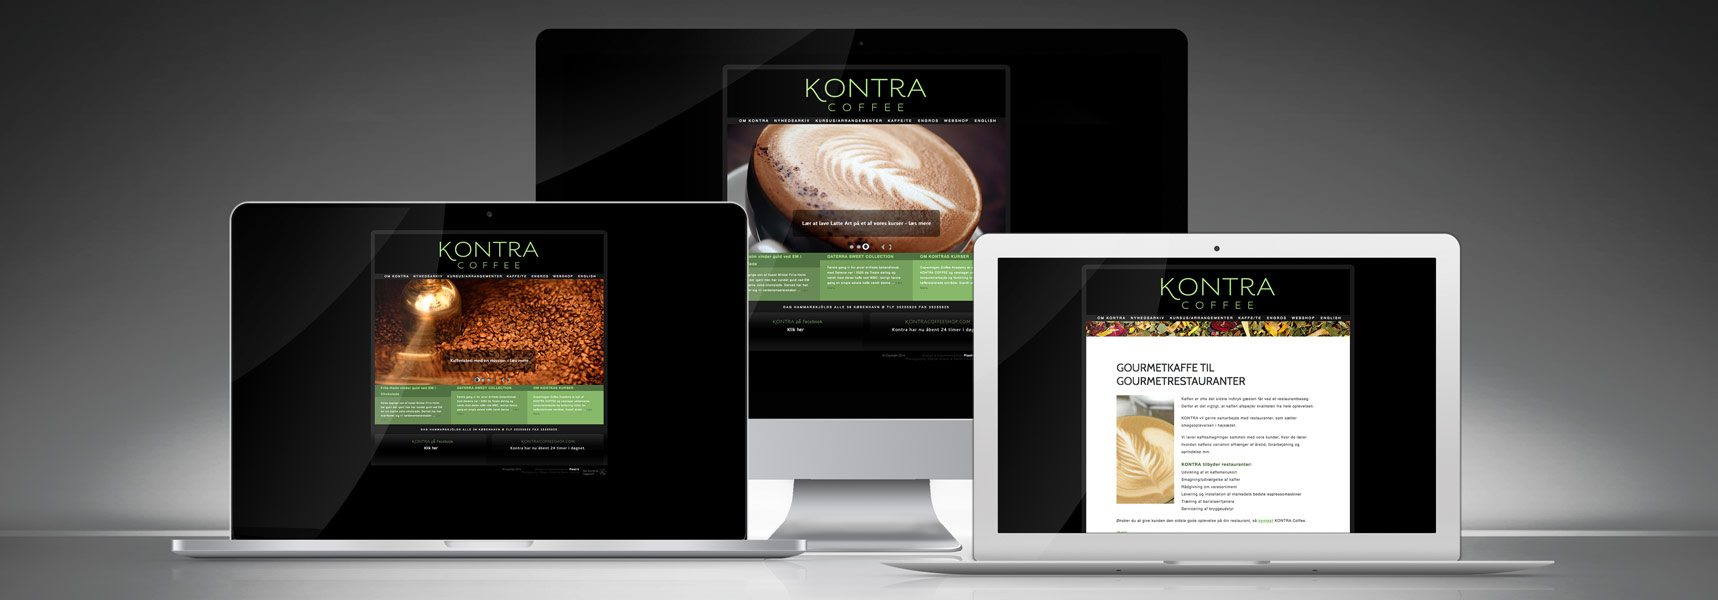 kontracoffee.com